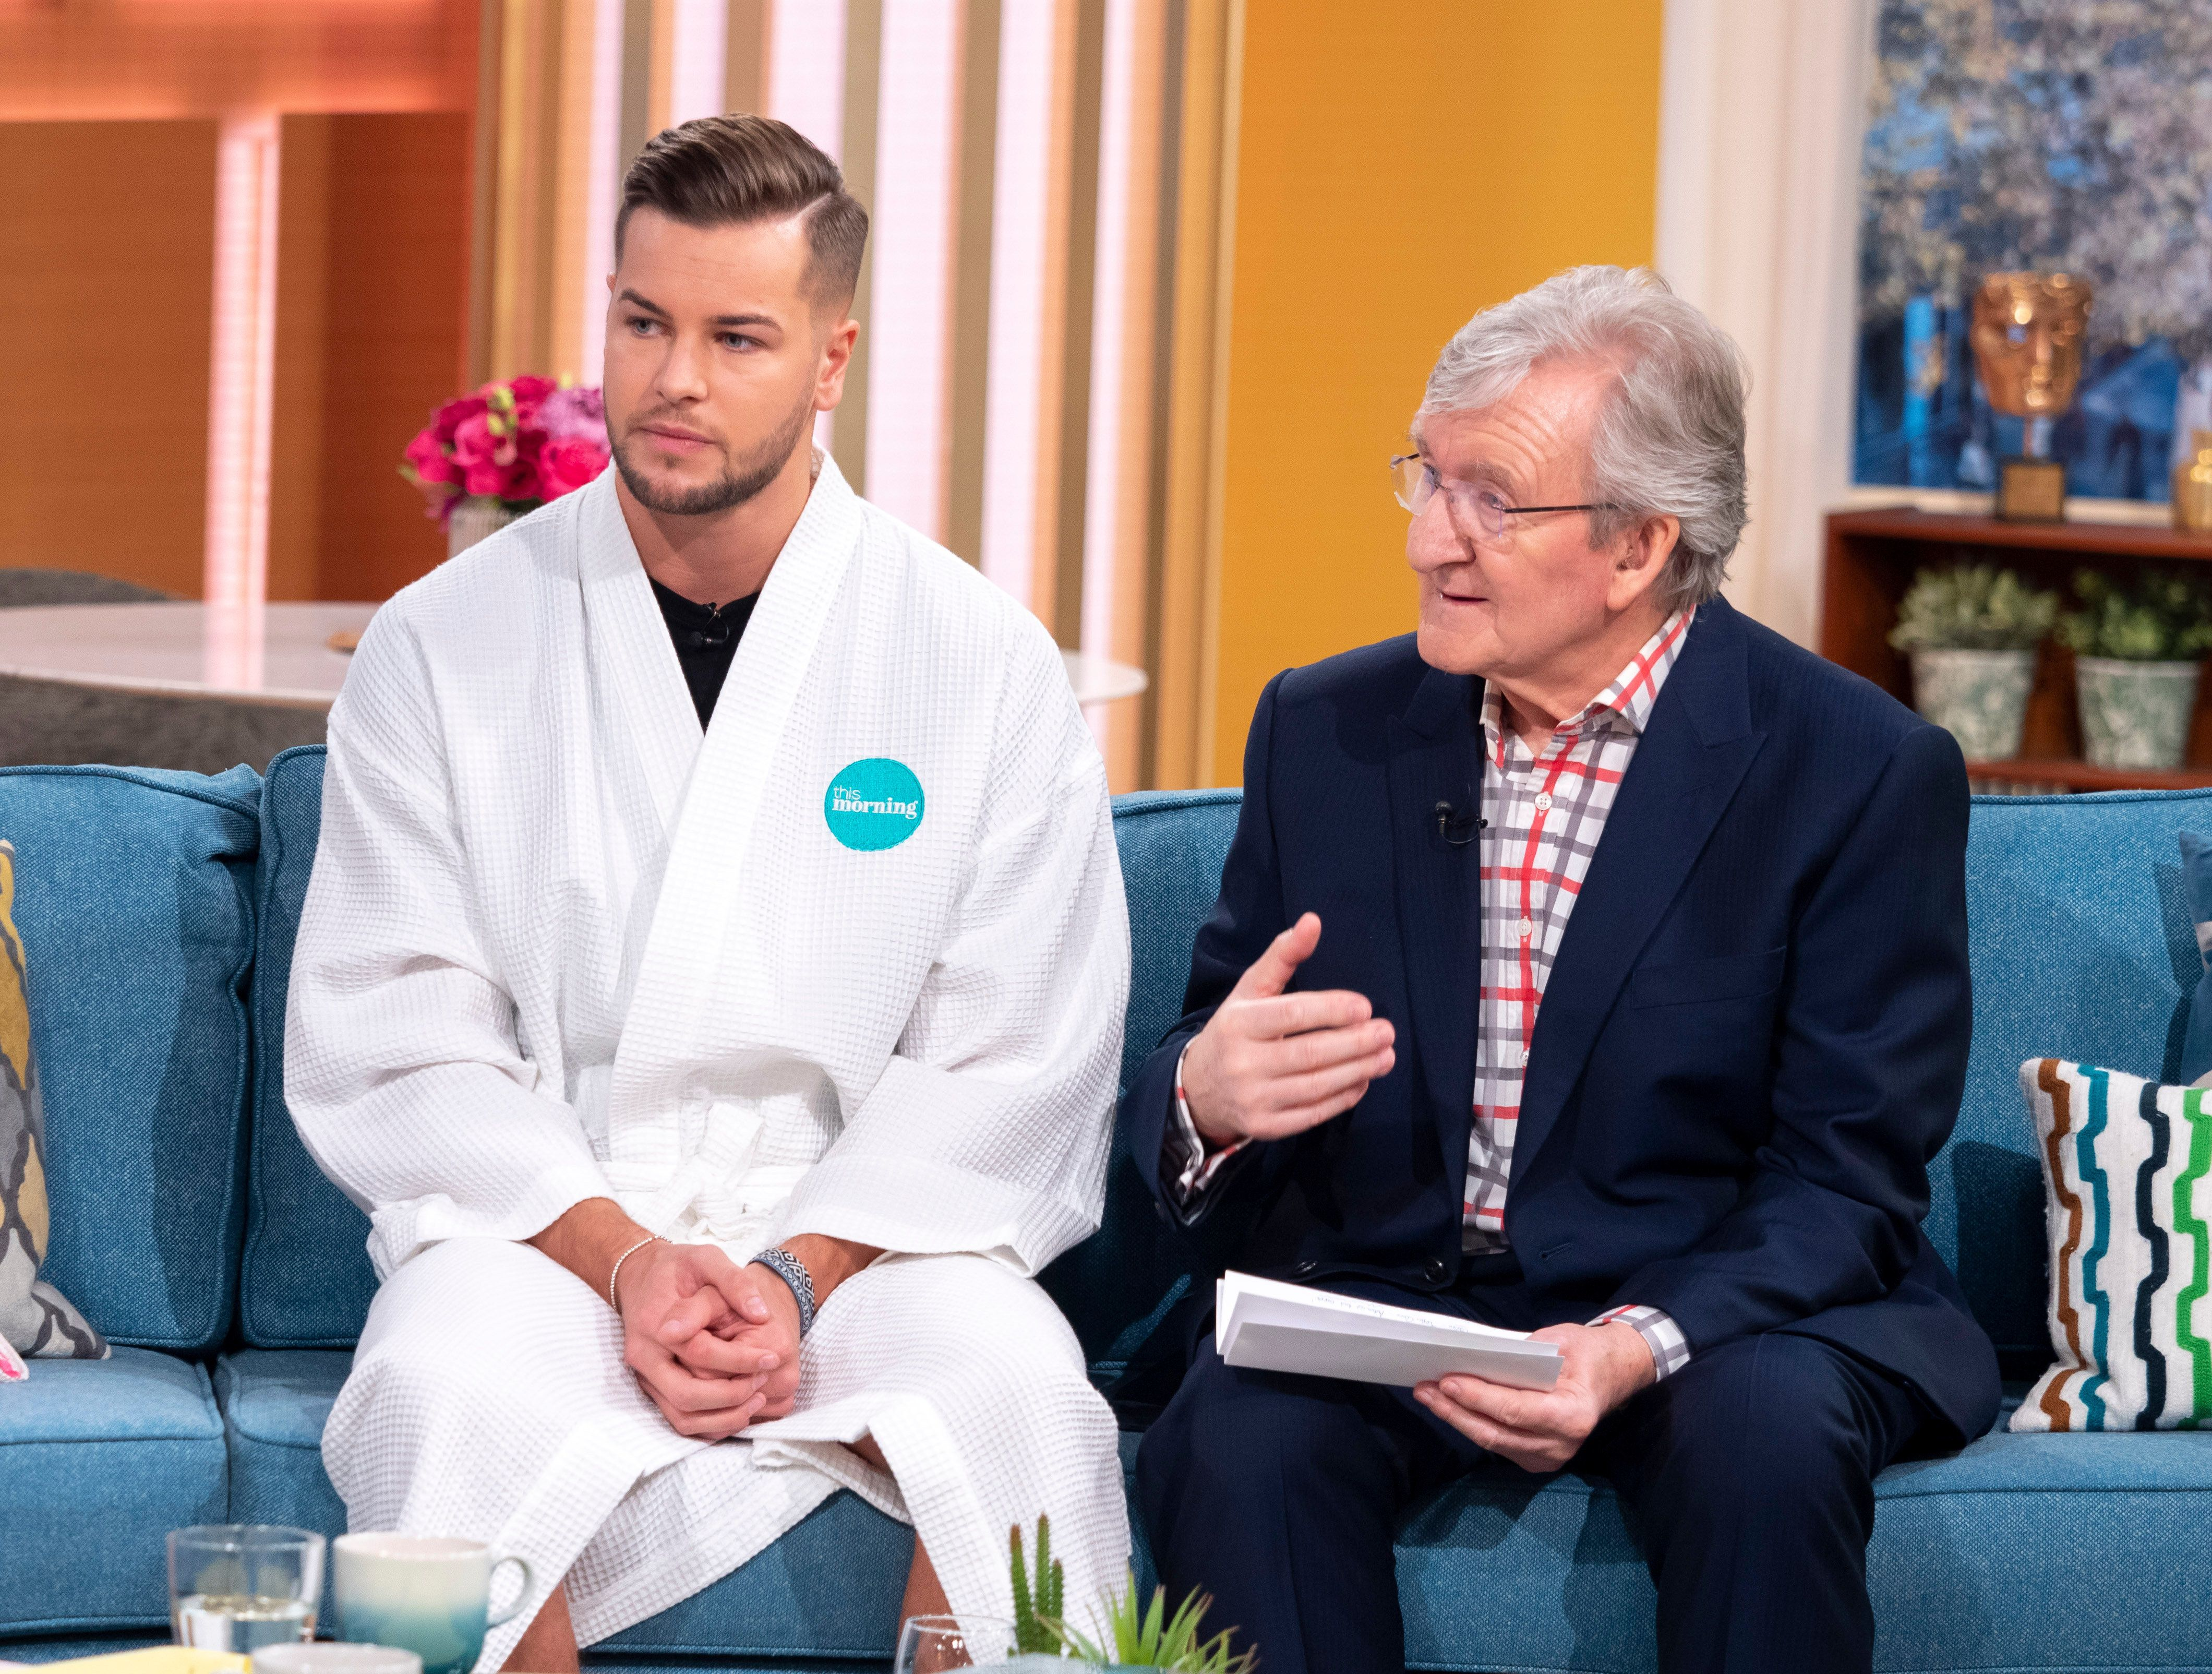 Chris Hughes underwent a live testicular exam